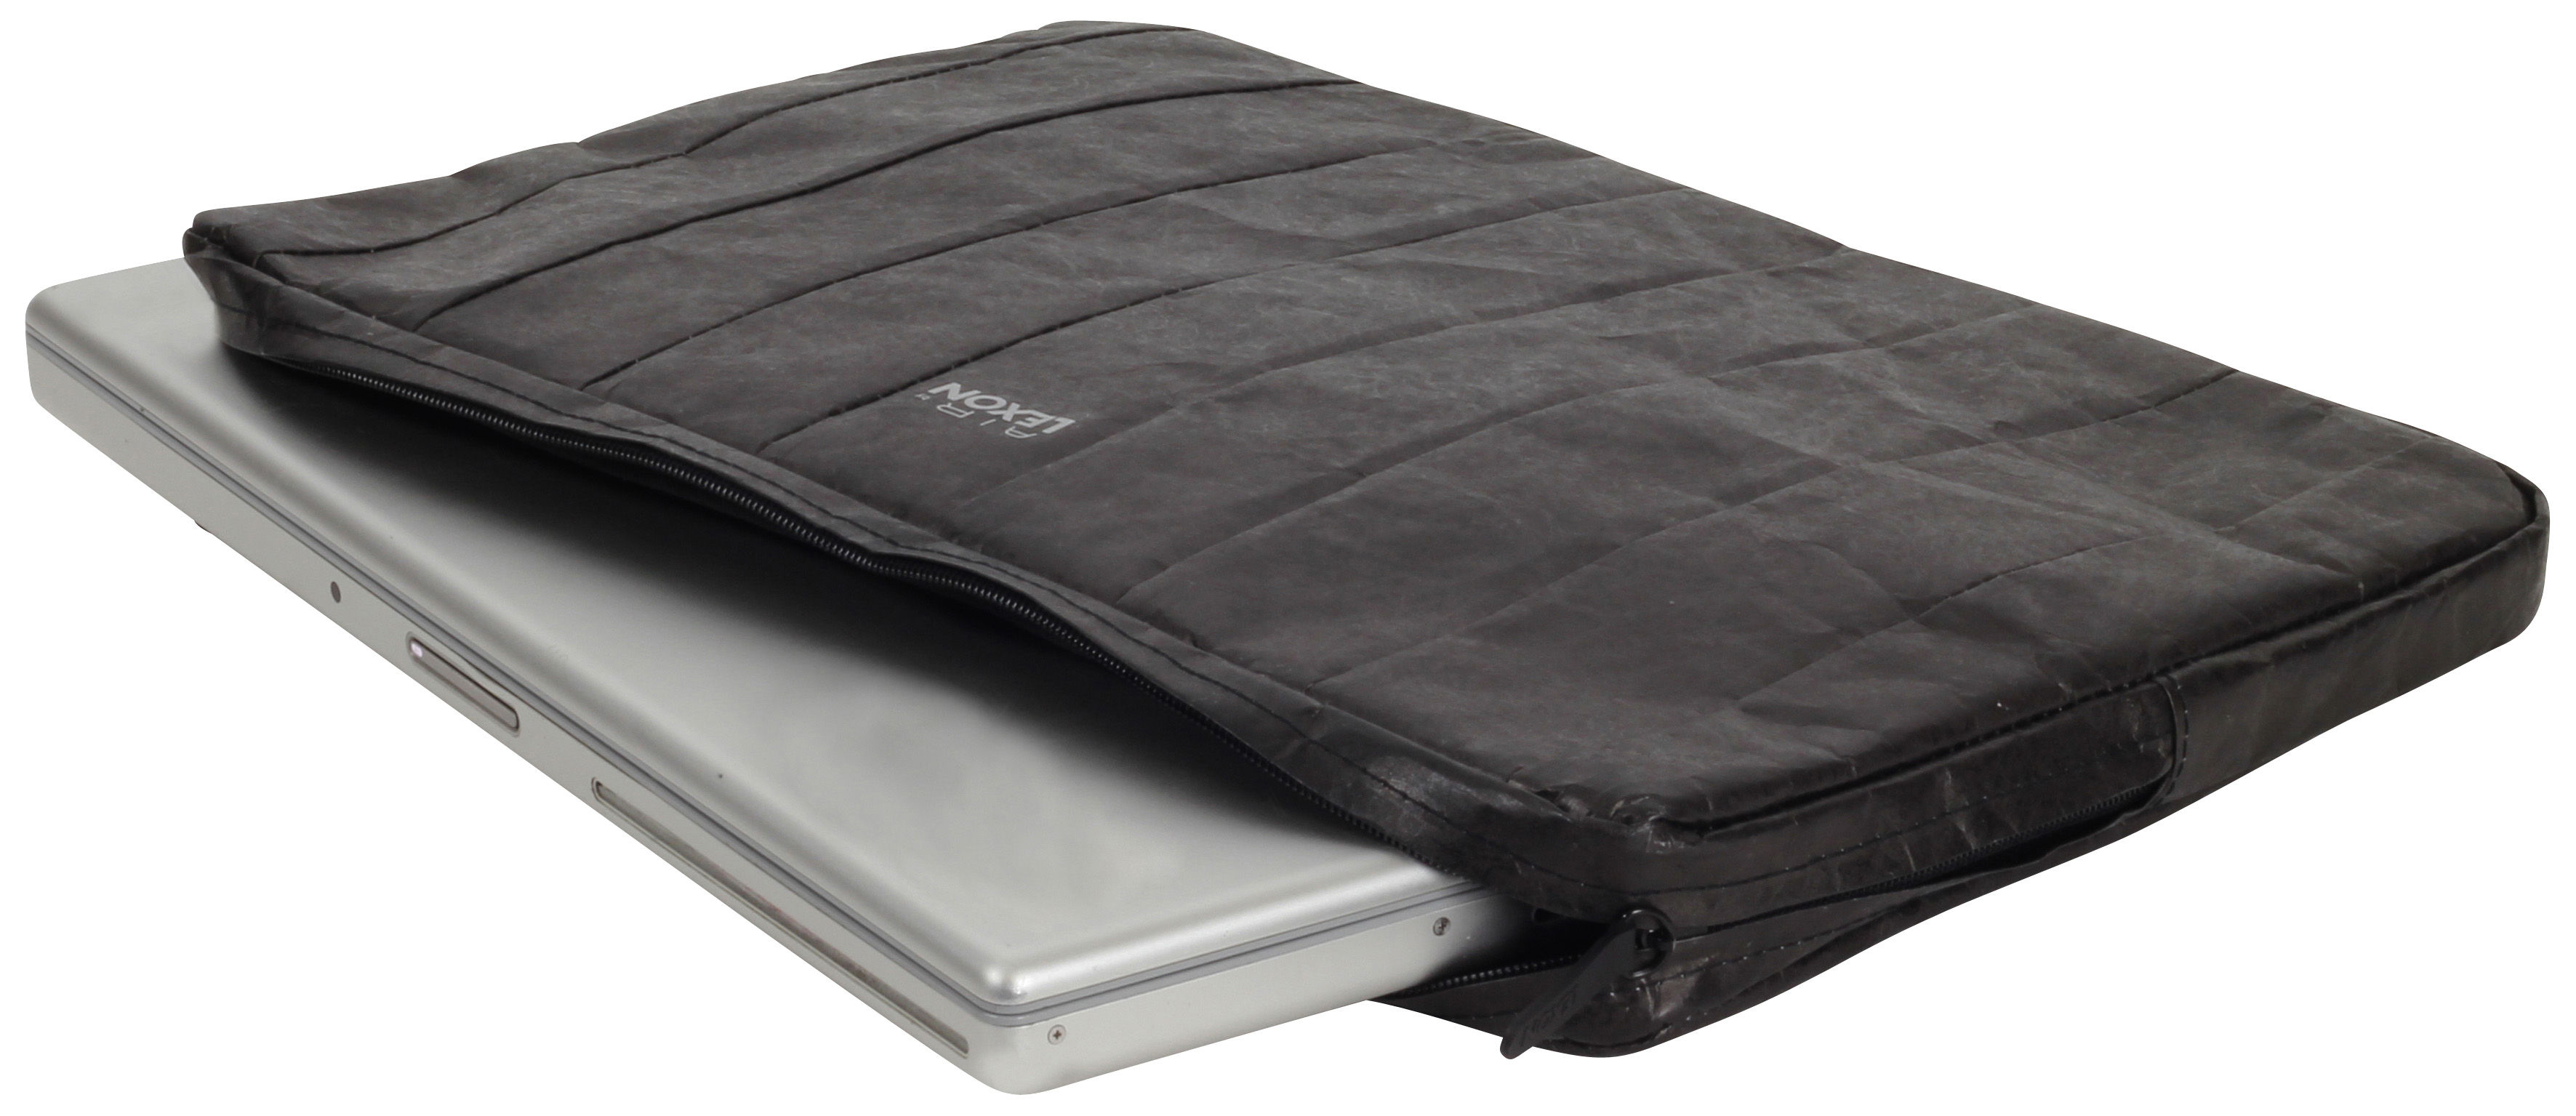 air h lle laptoptasche 37 x 26 cm schwarz by lexon made in design. Black Bedroom Furniture Sets. Home Design Ideas